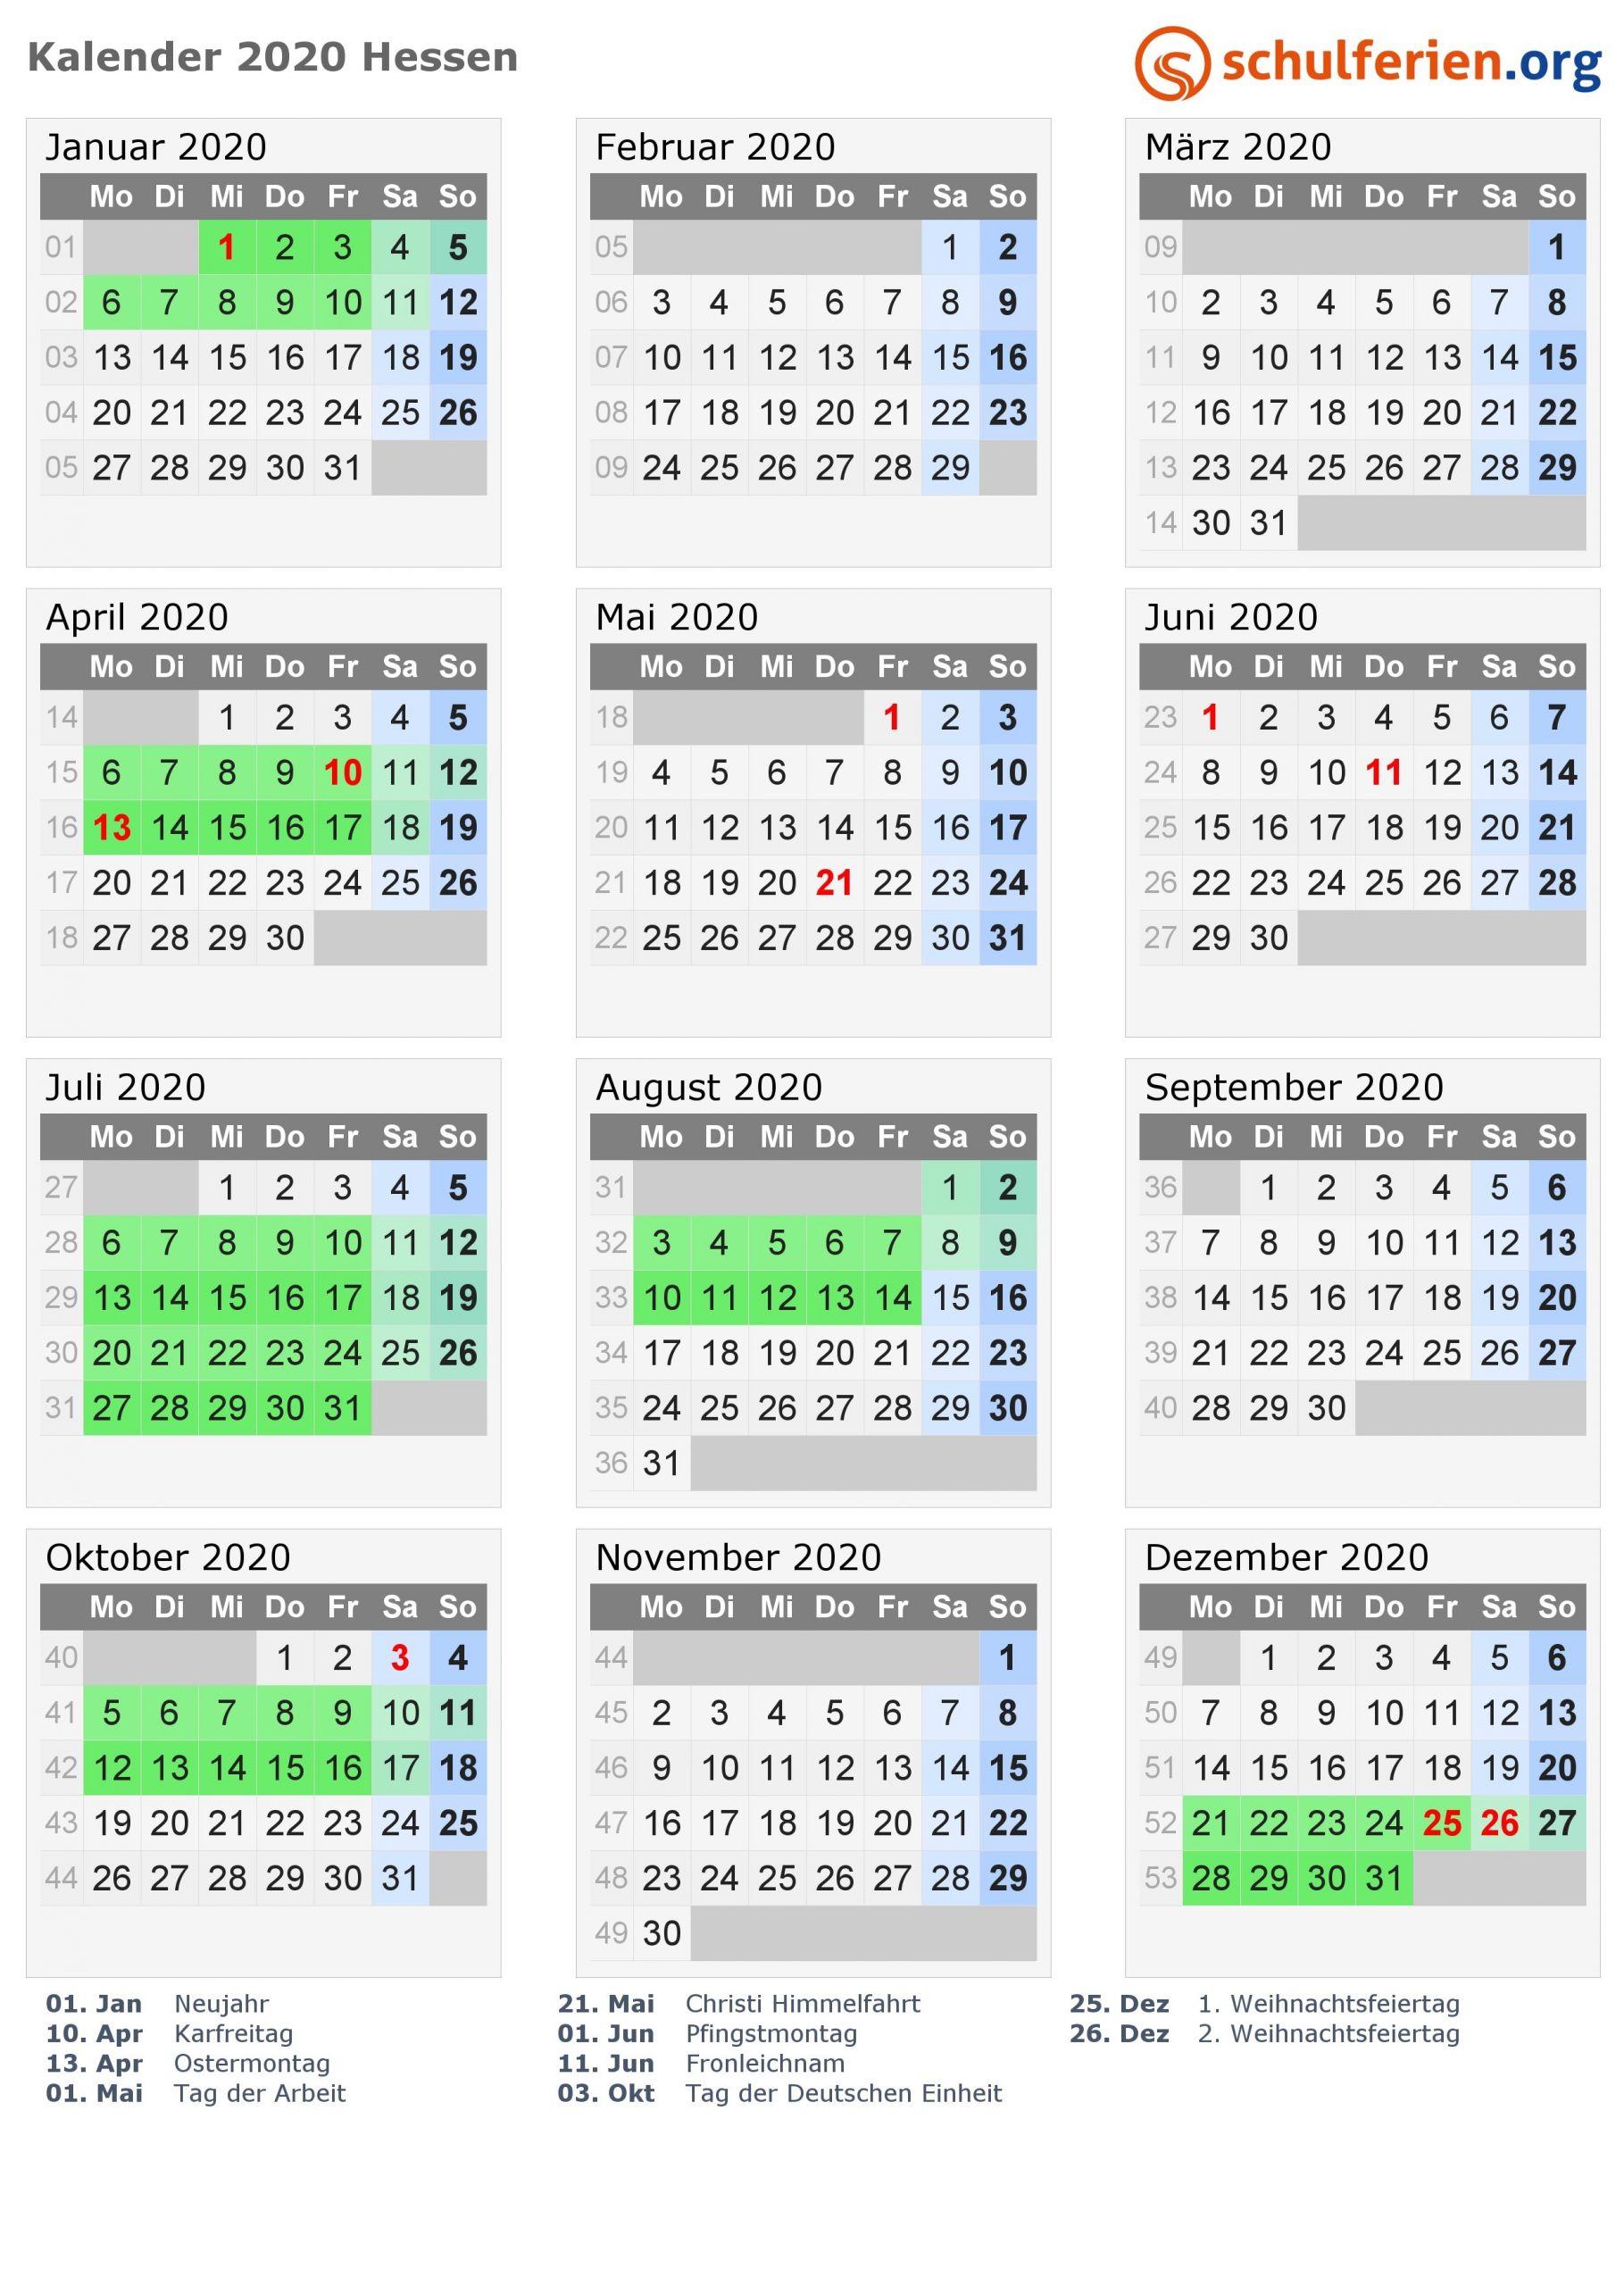 kalender feriendichte 2019 pdf mas arriba a fecha kalender 2018 2019 2020 hessen of kalender feriendichte 2019 pdf